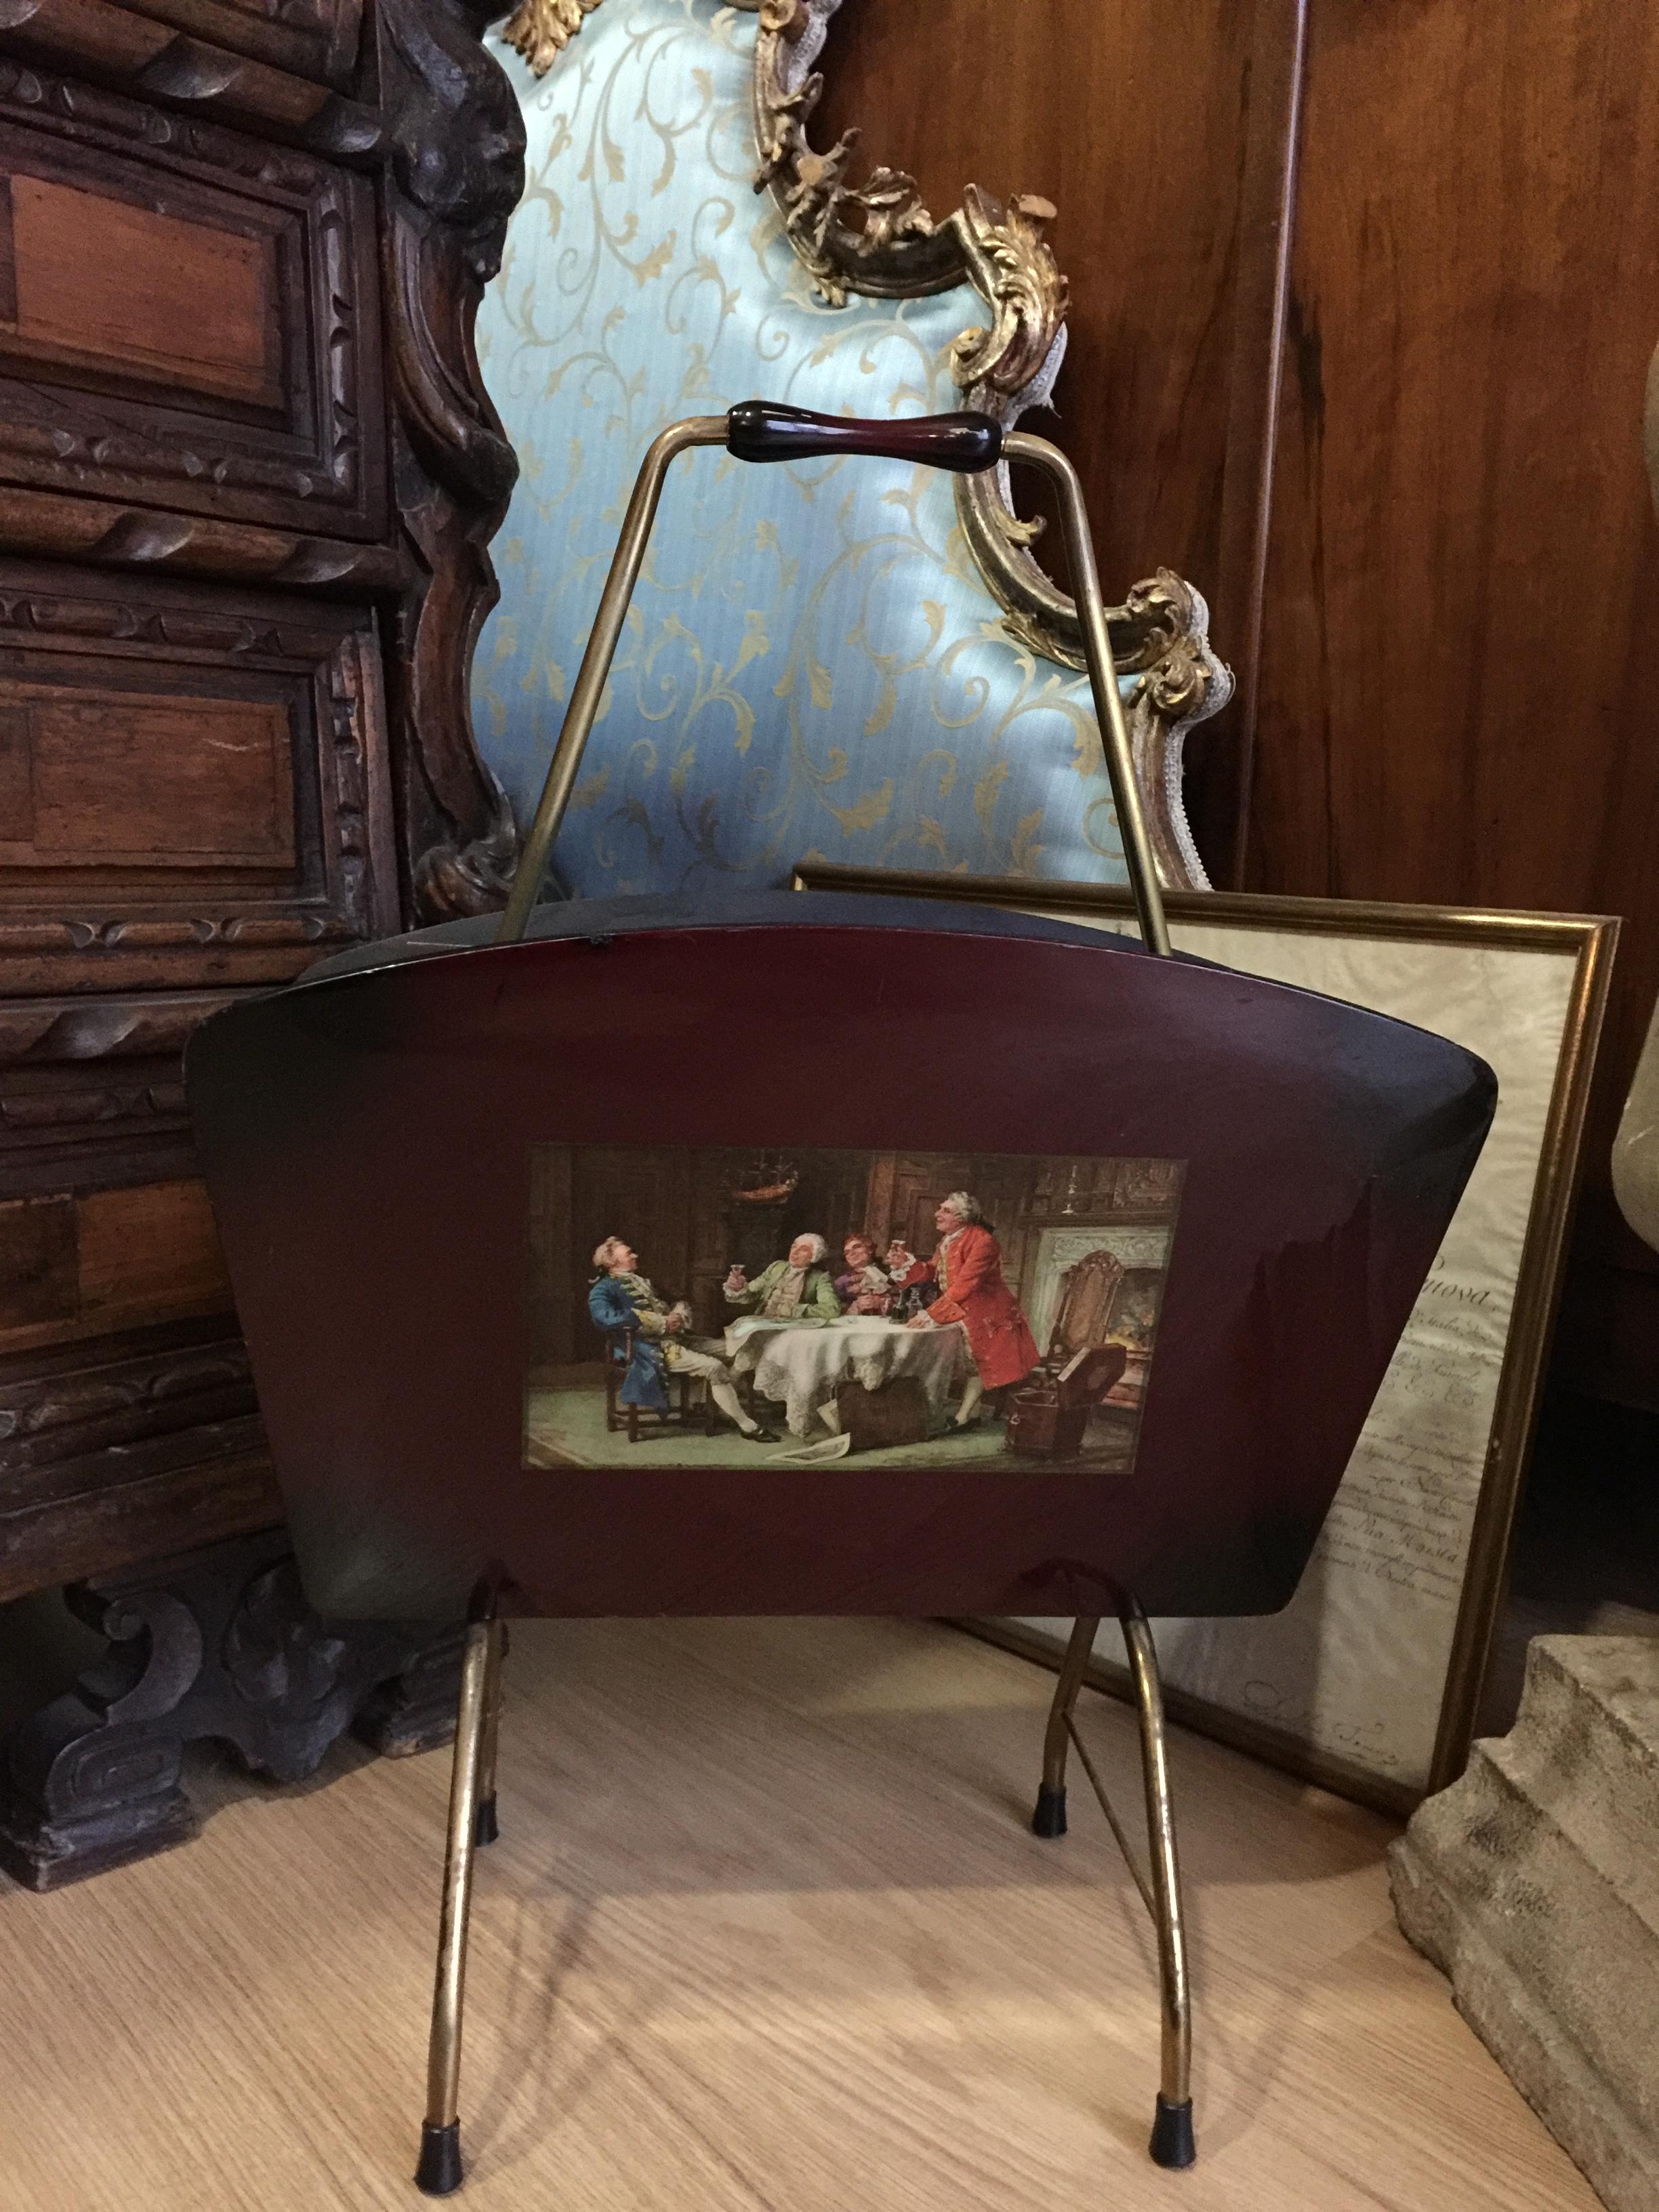 Vendita Porta Riviste.Porta Riviste Vintage Vendita E Restauro Antichita Cosmo